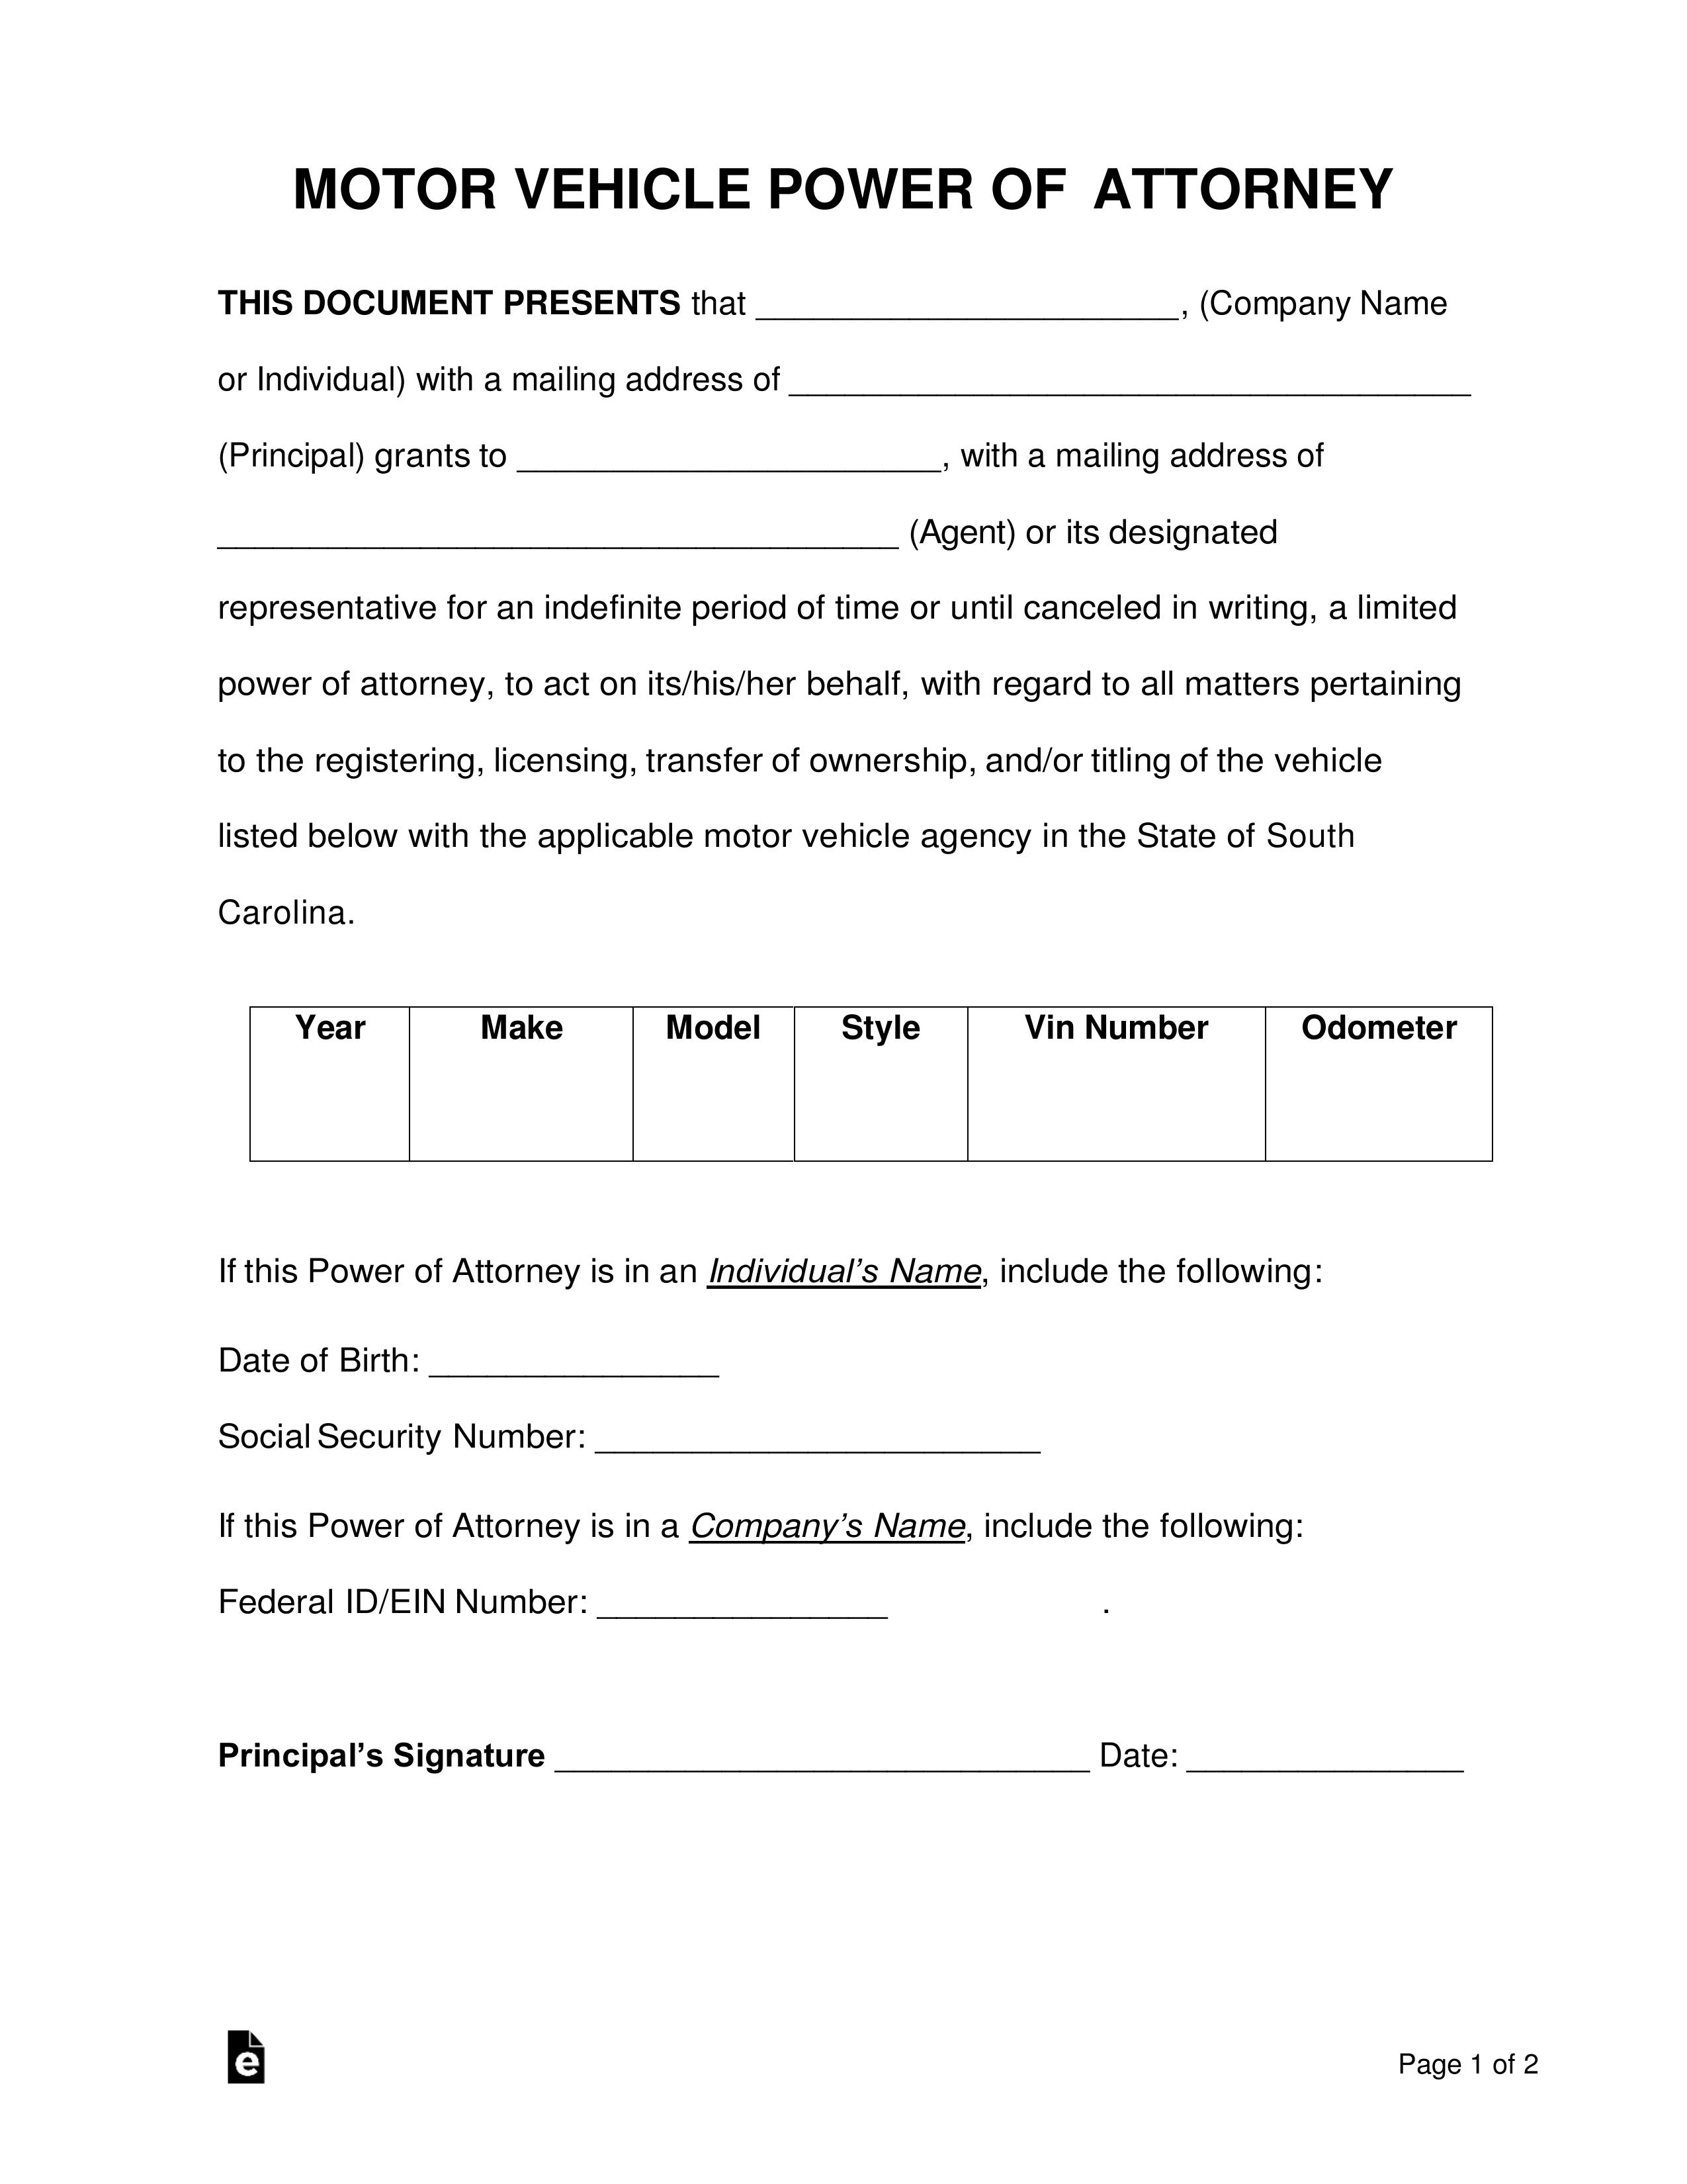 Signing Declaration Worksheet